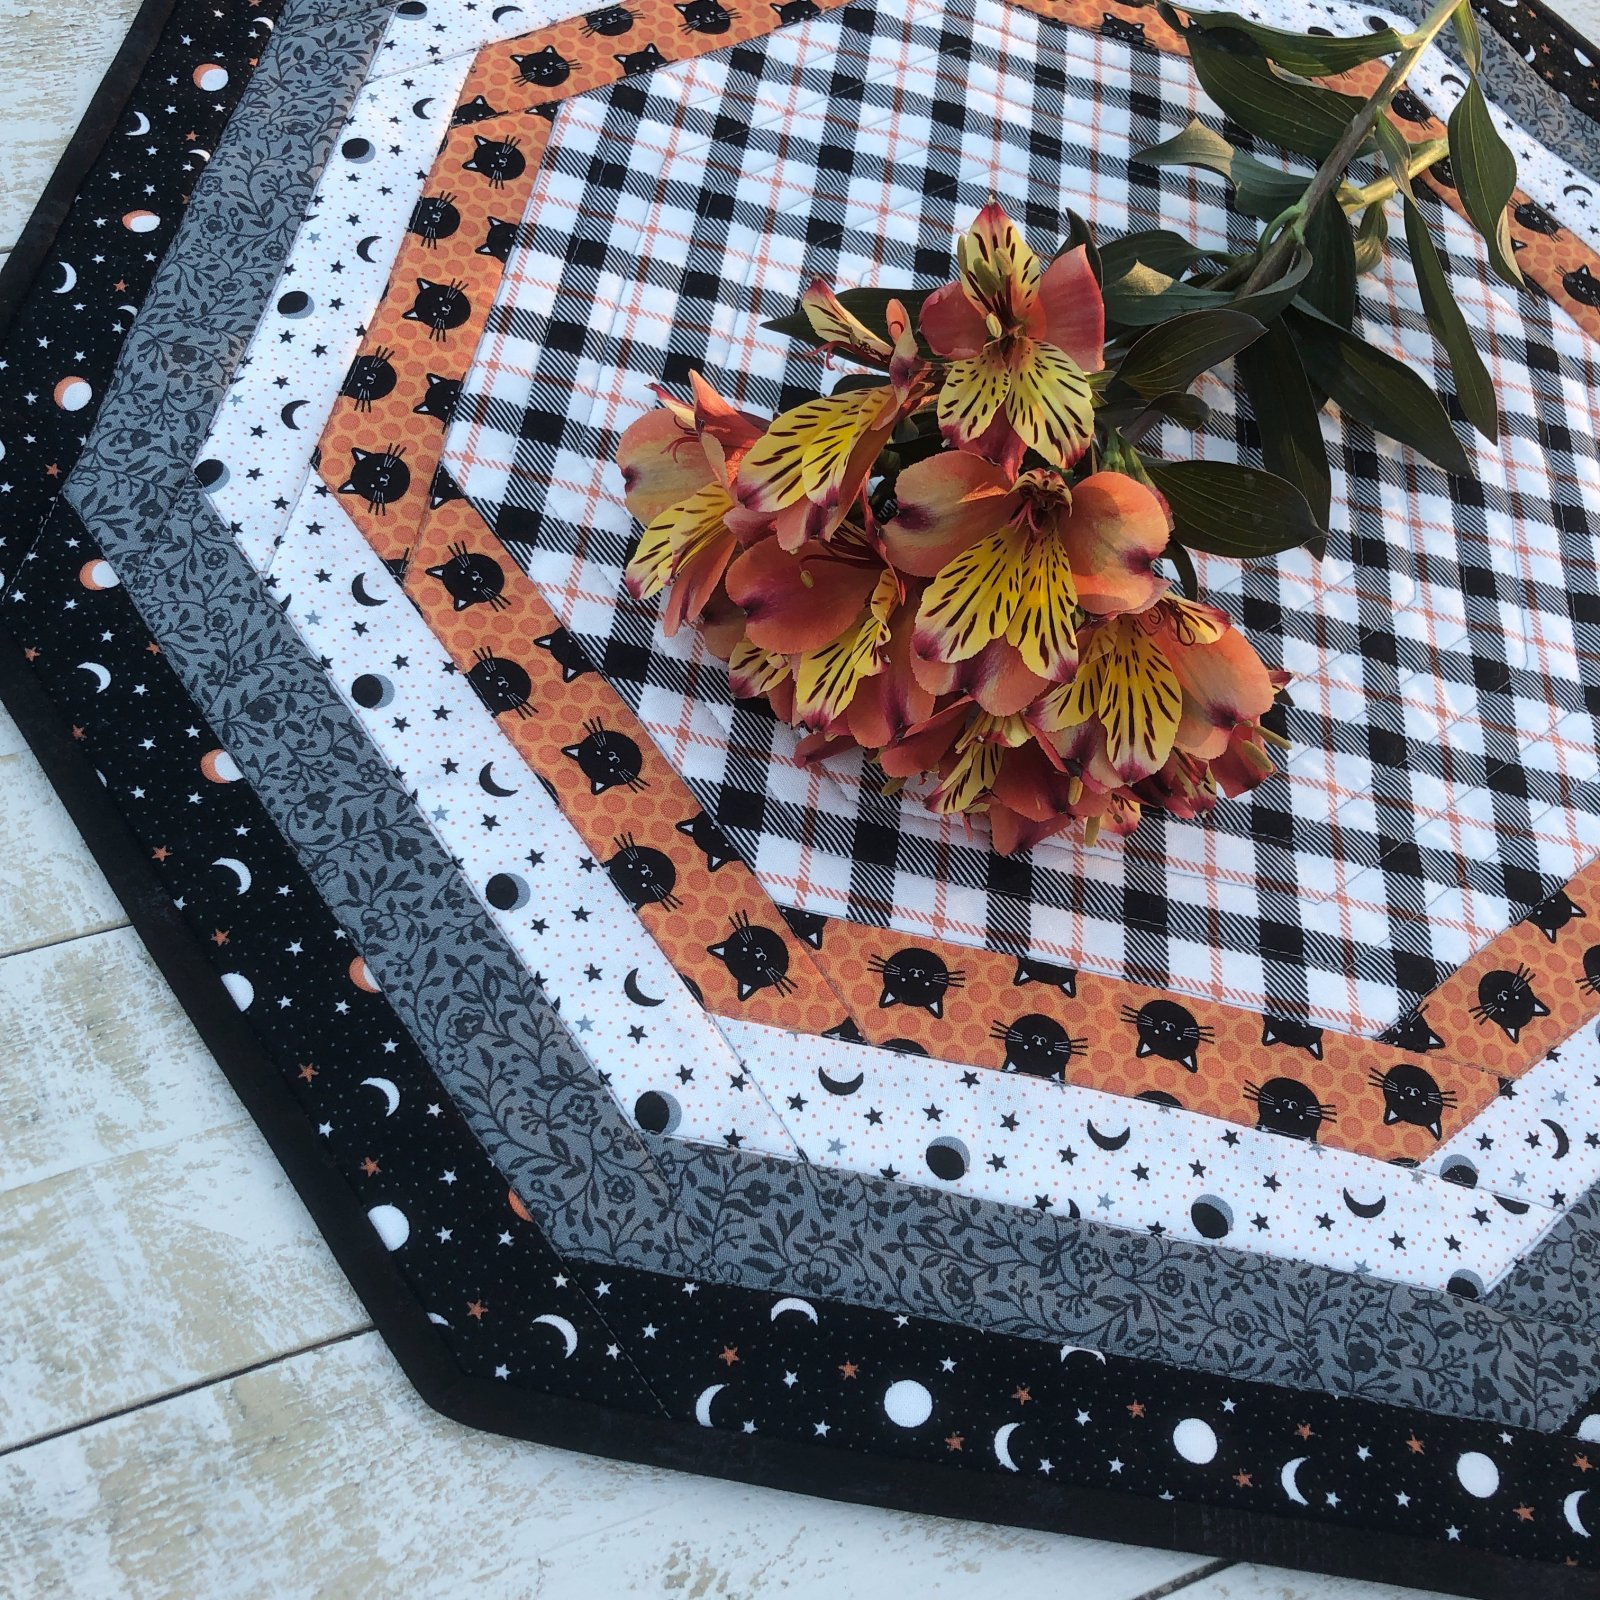 Centerpiece Tablemat kit for Halloween